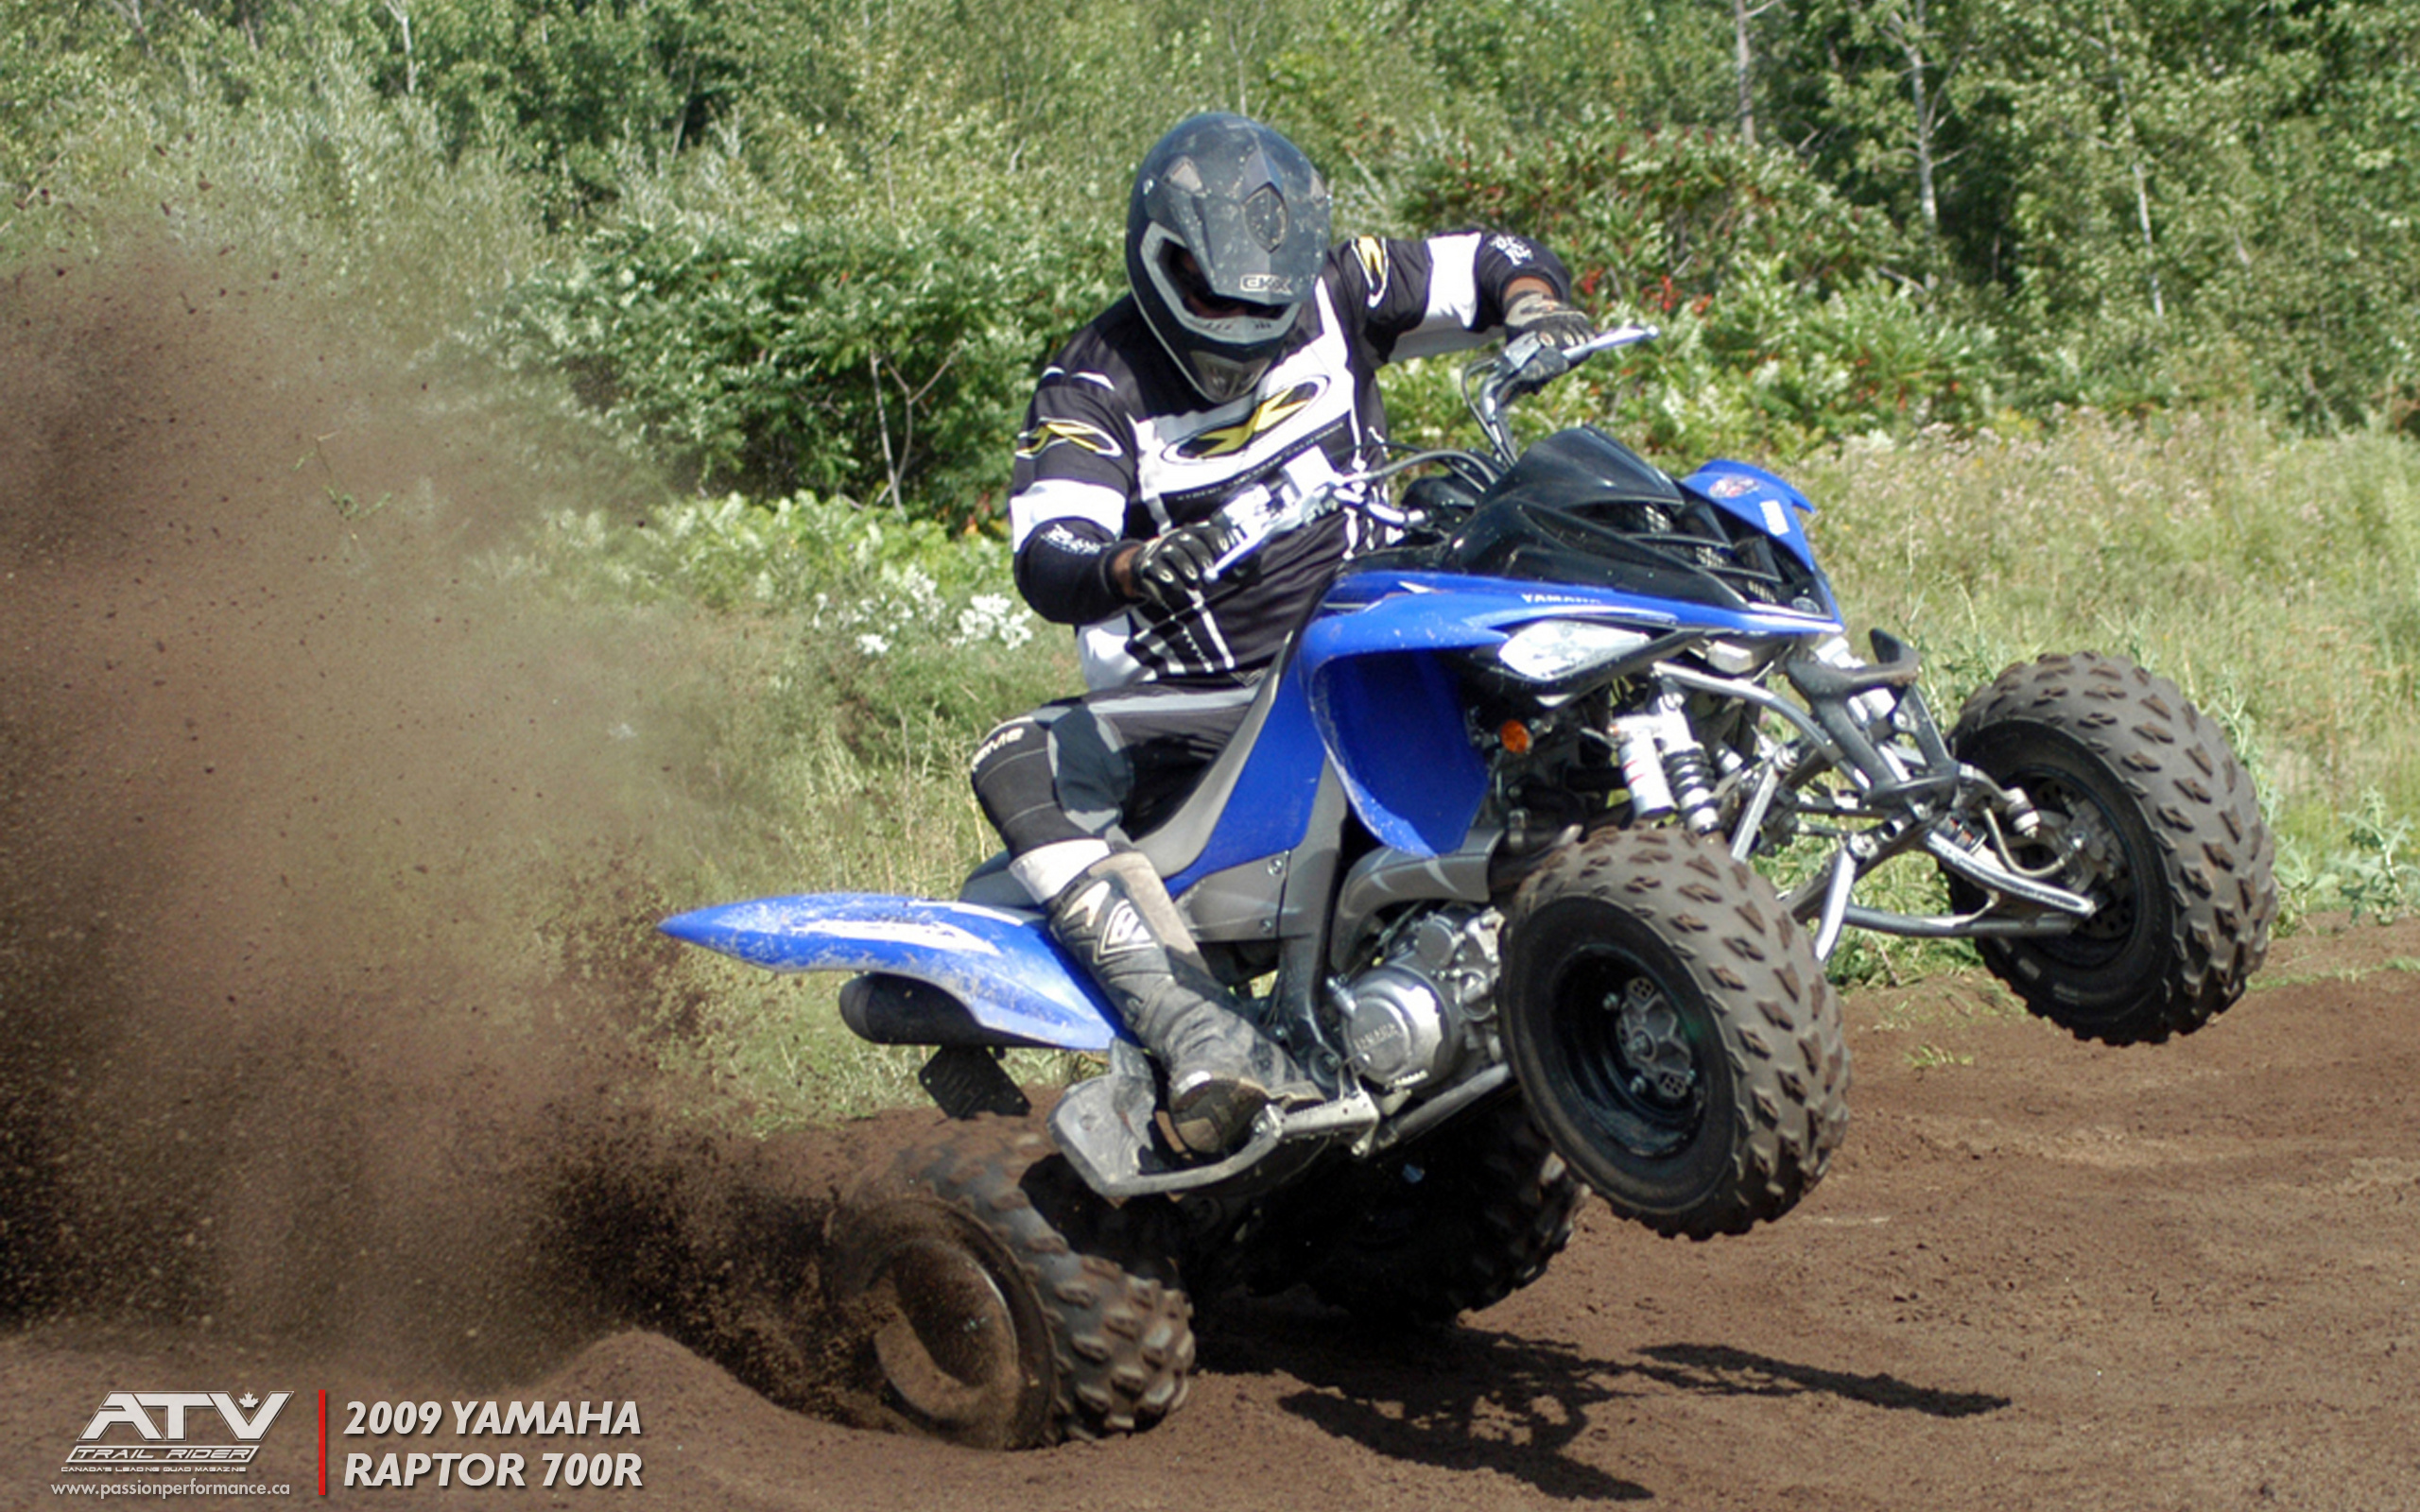 YAMAHA RAPTOR atv quad offroad motorbike bike dirtbike poster h 2560x1600